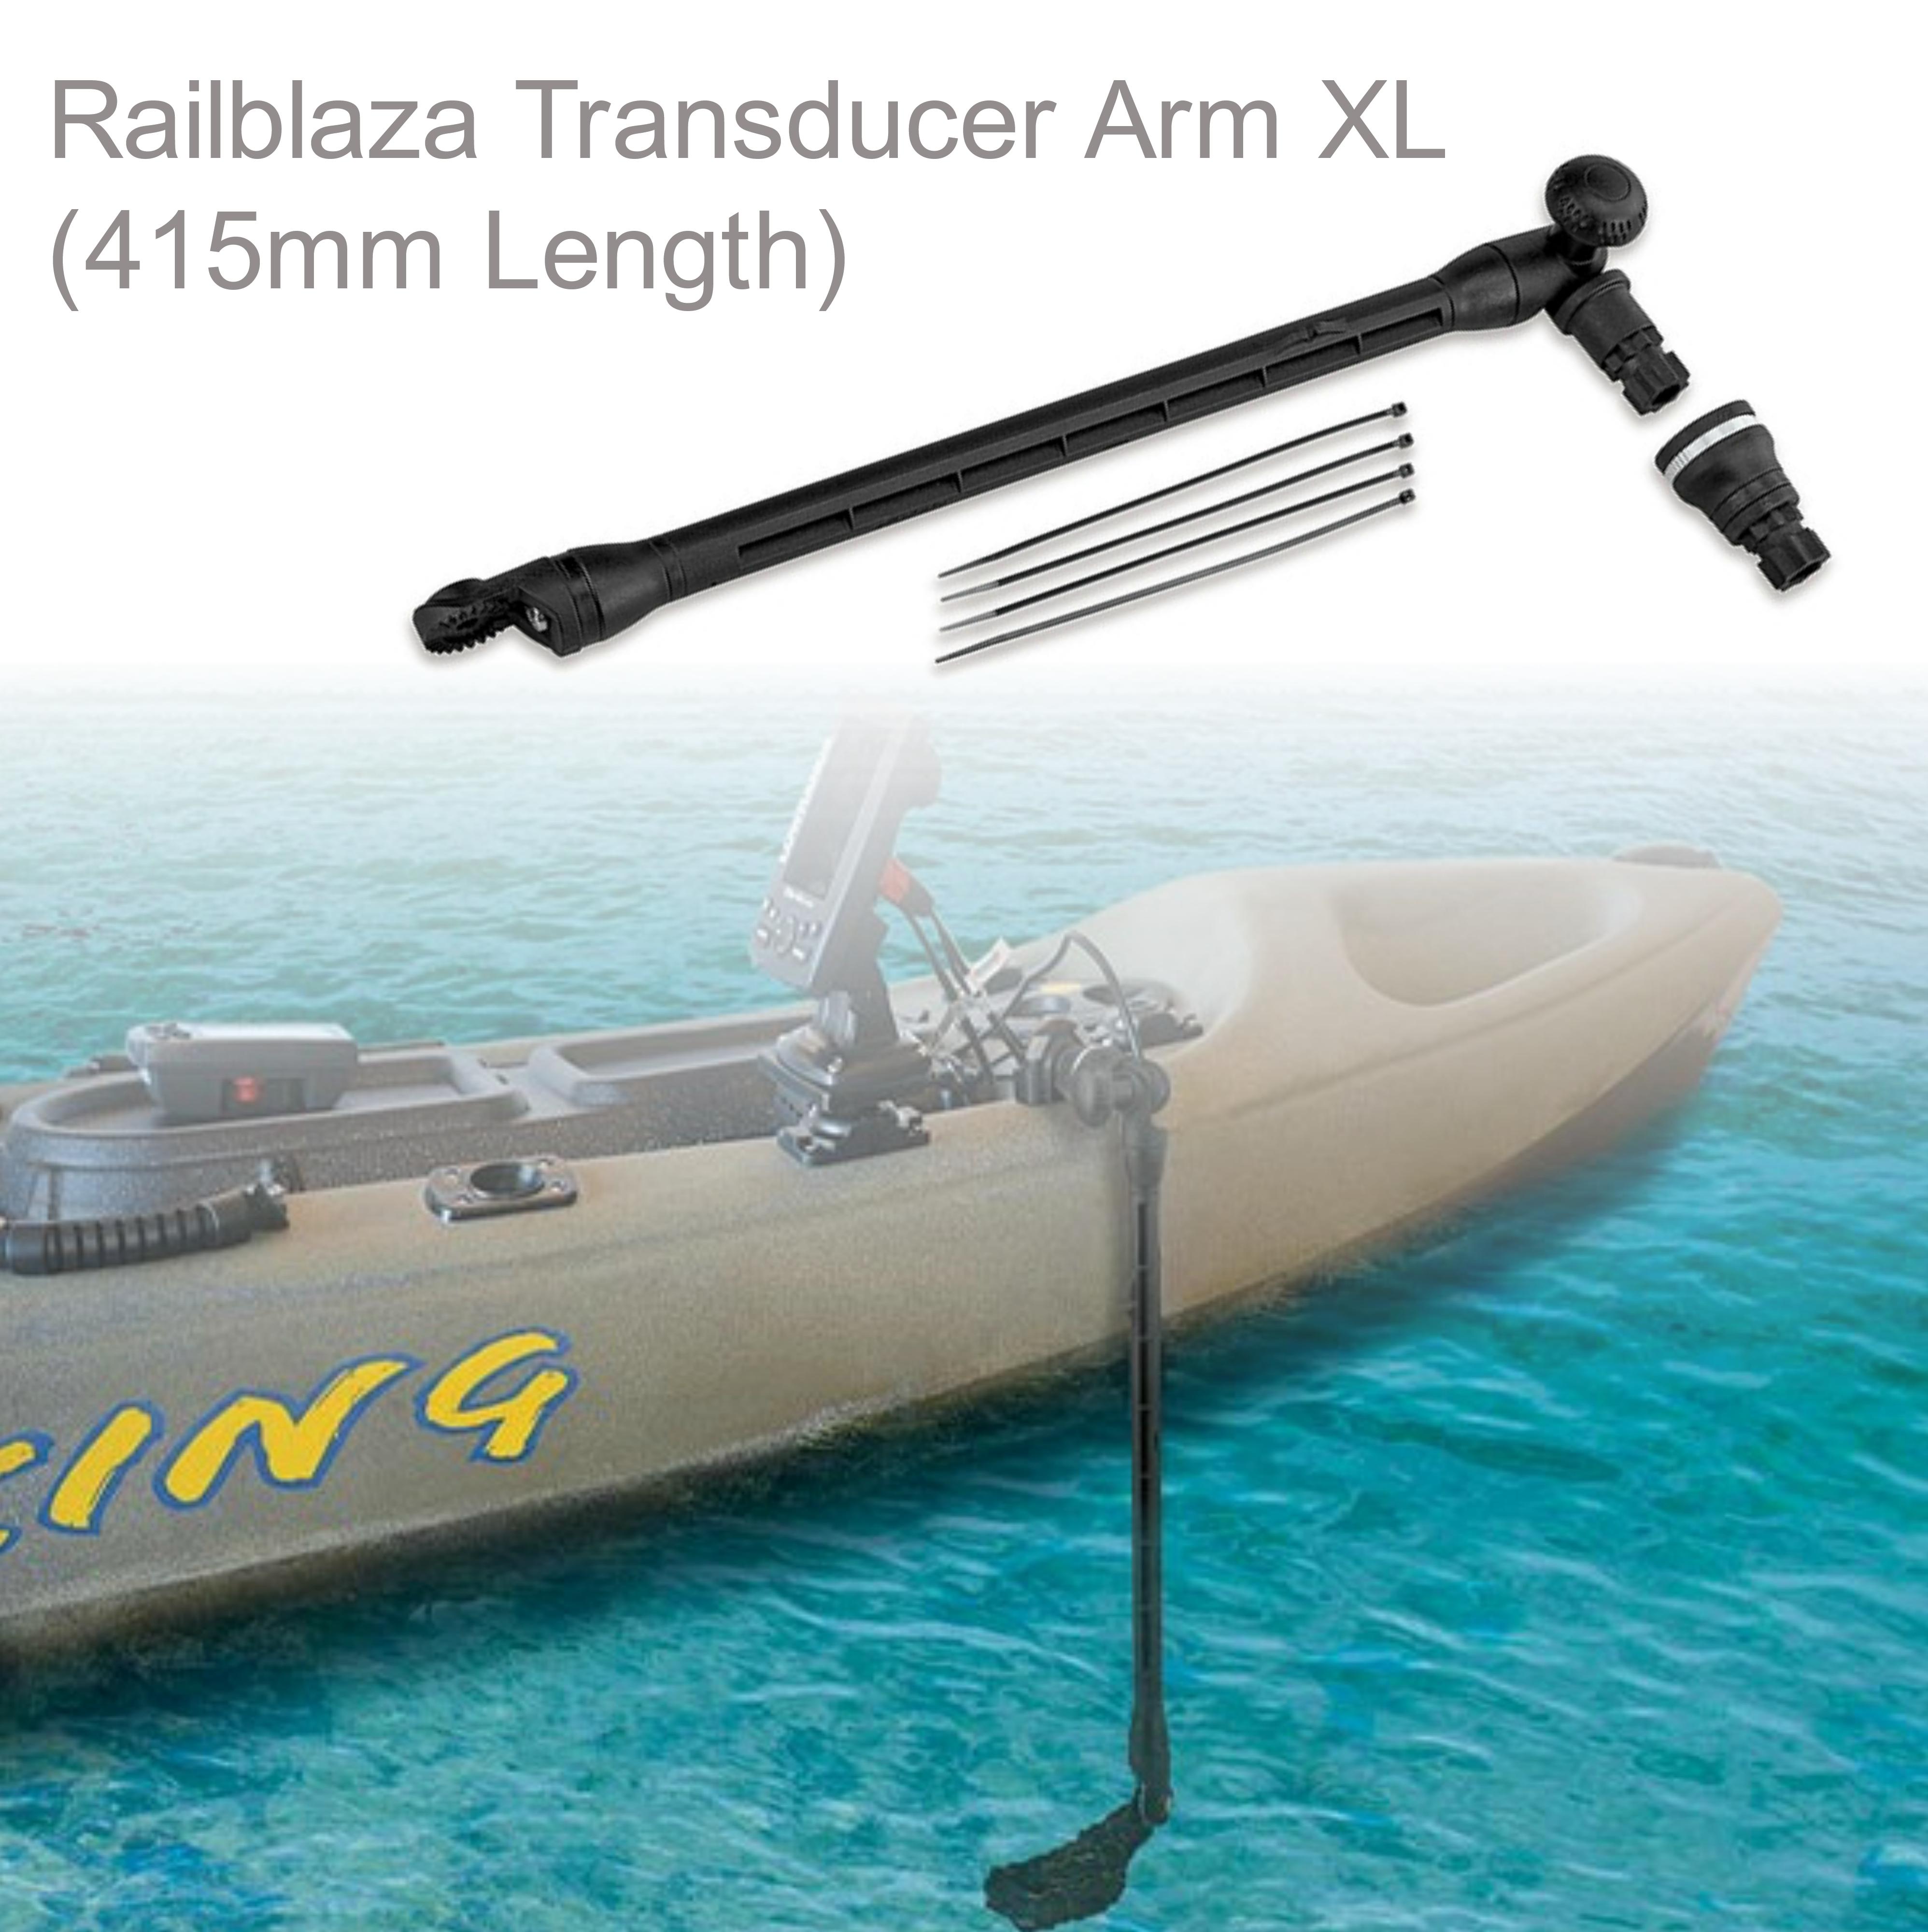 Railblaza Depth Sounder Transducer Arm XL(415mm Length) For Kayak Dinghy Canoe